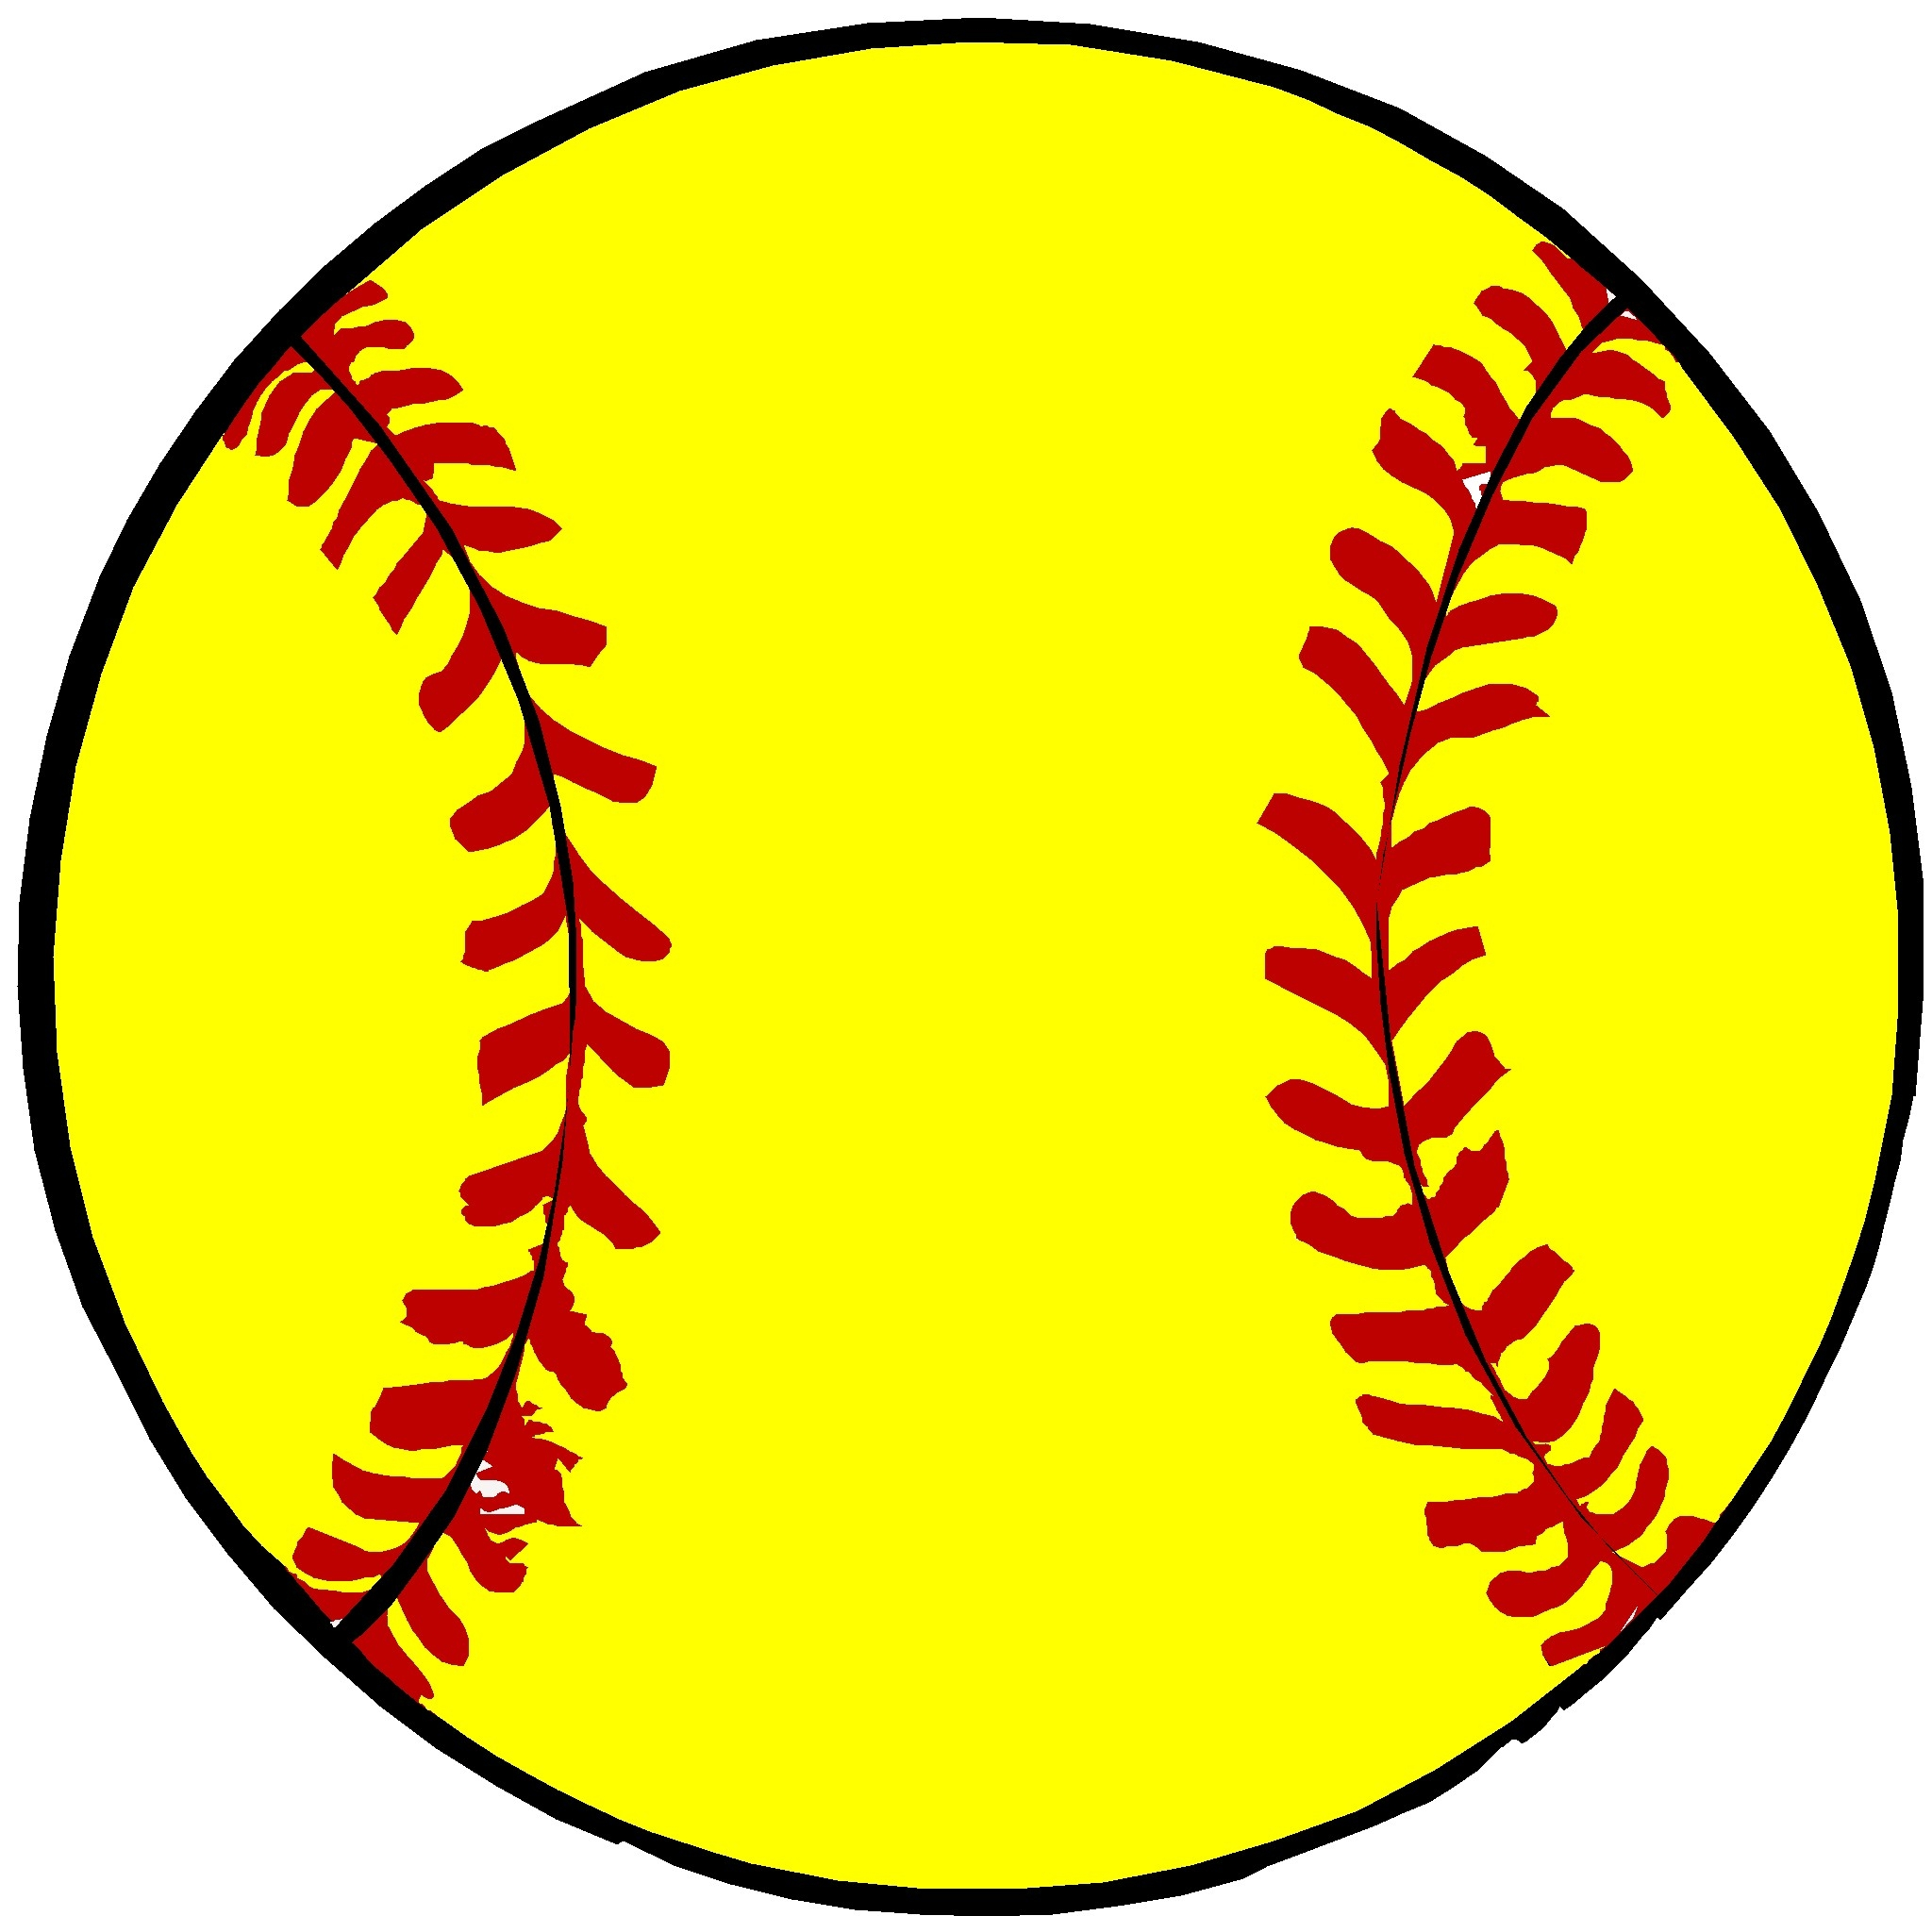 Softball Clipart Free.